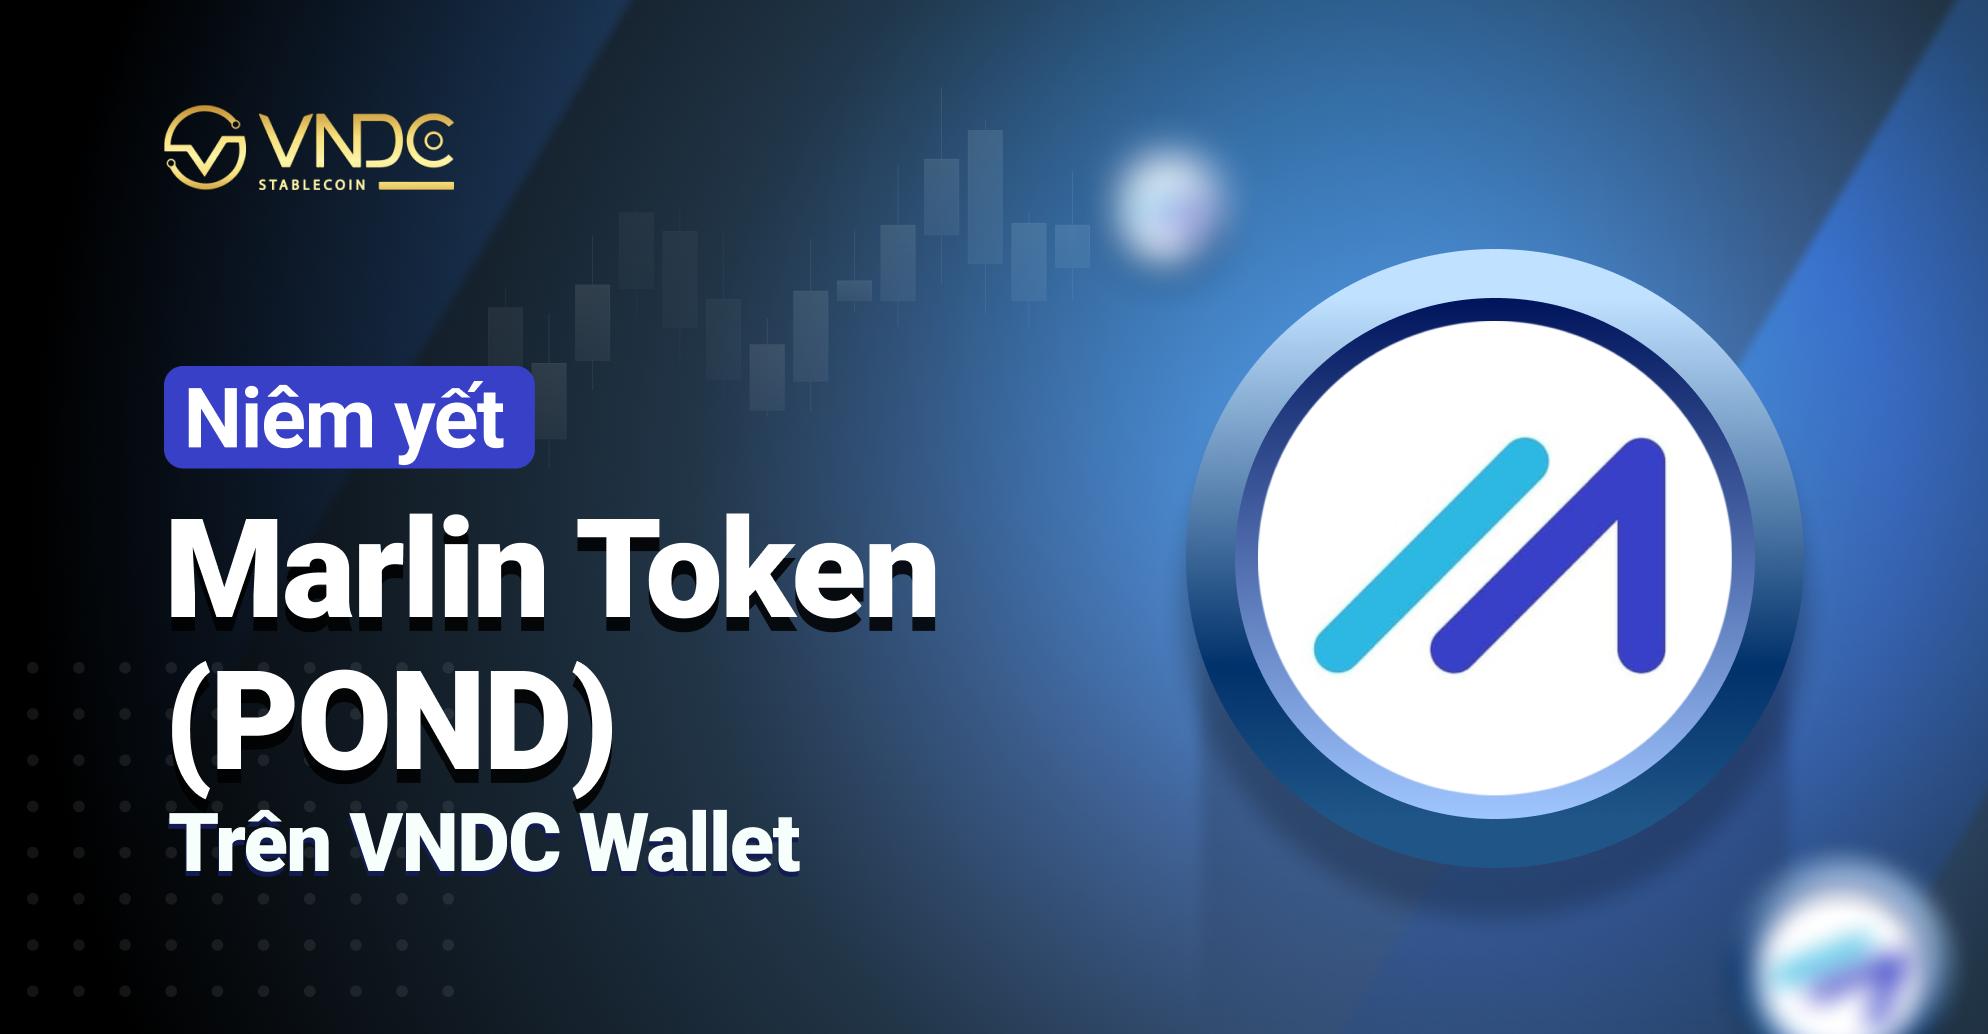 Niêm yết Marlin Token (POND) trên VNDC Wallet